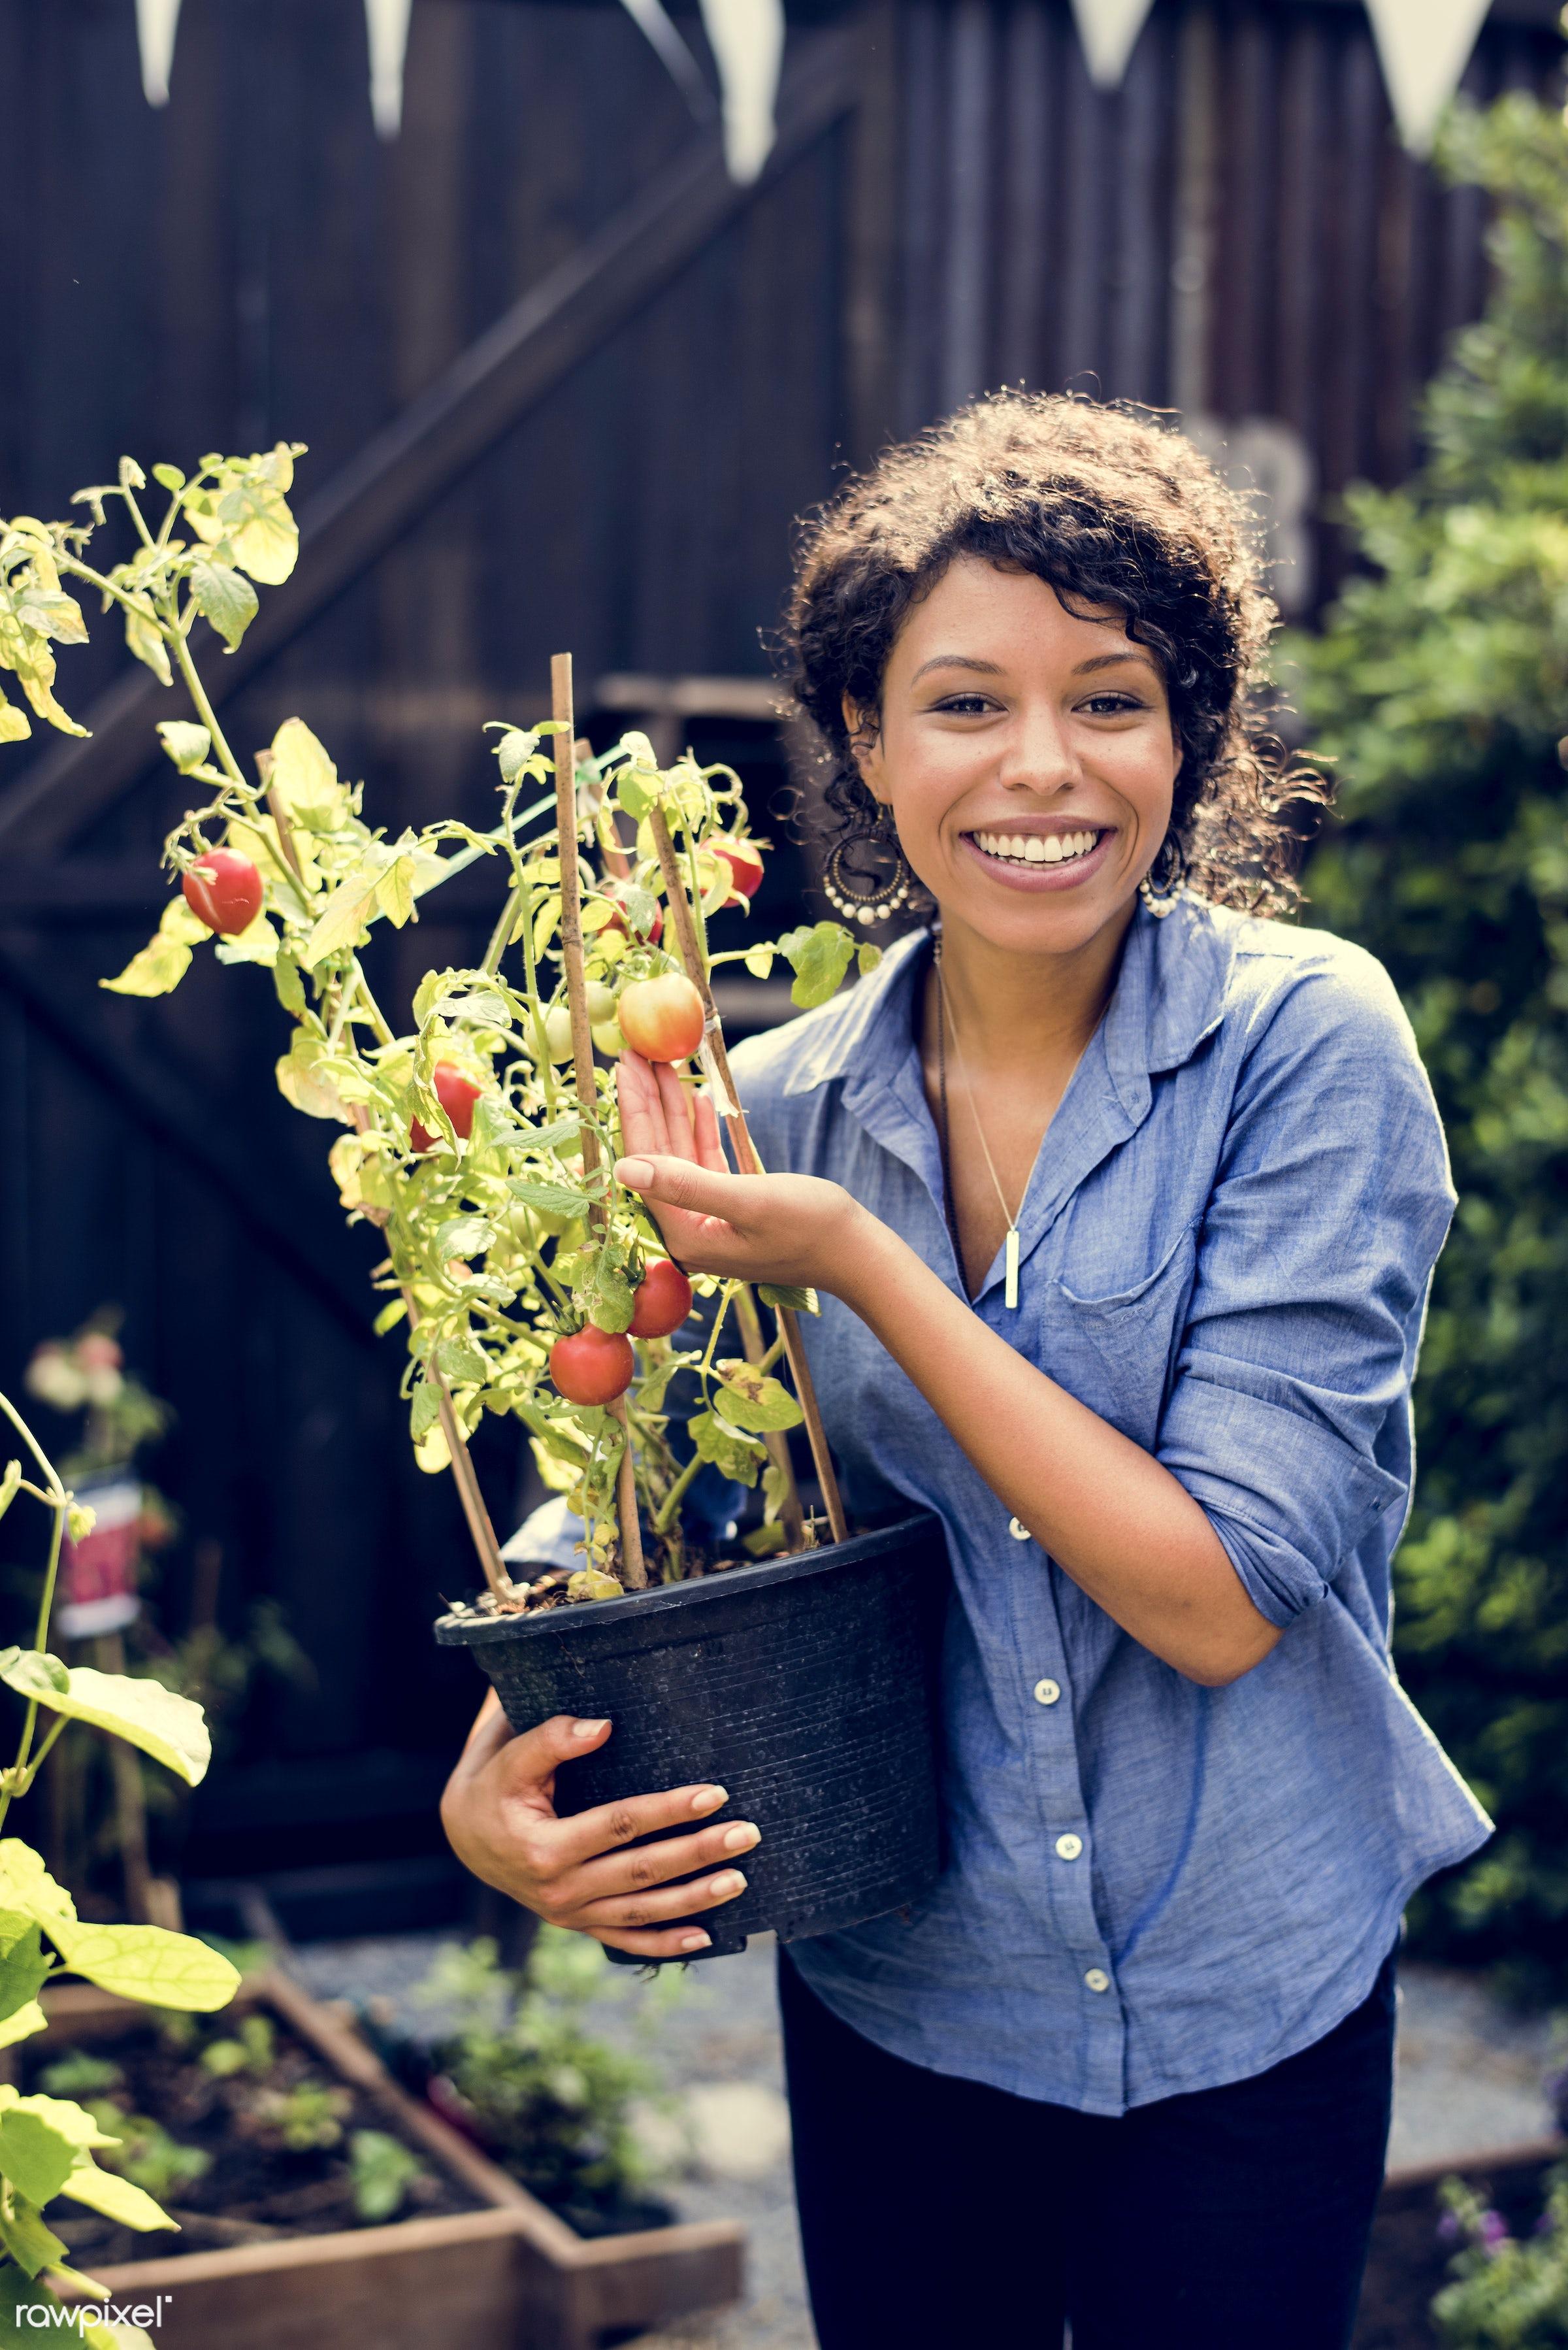 plant, countryside, person, botany, greenhouse, shrub, botanical, plantation, caucasian, tree, nature, farmer, woman,...